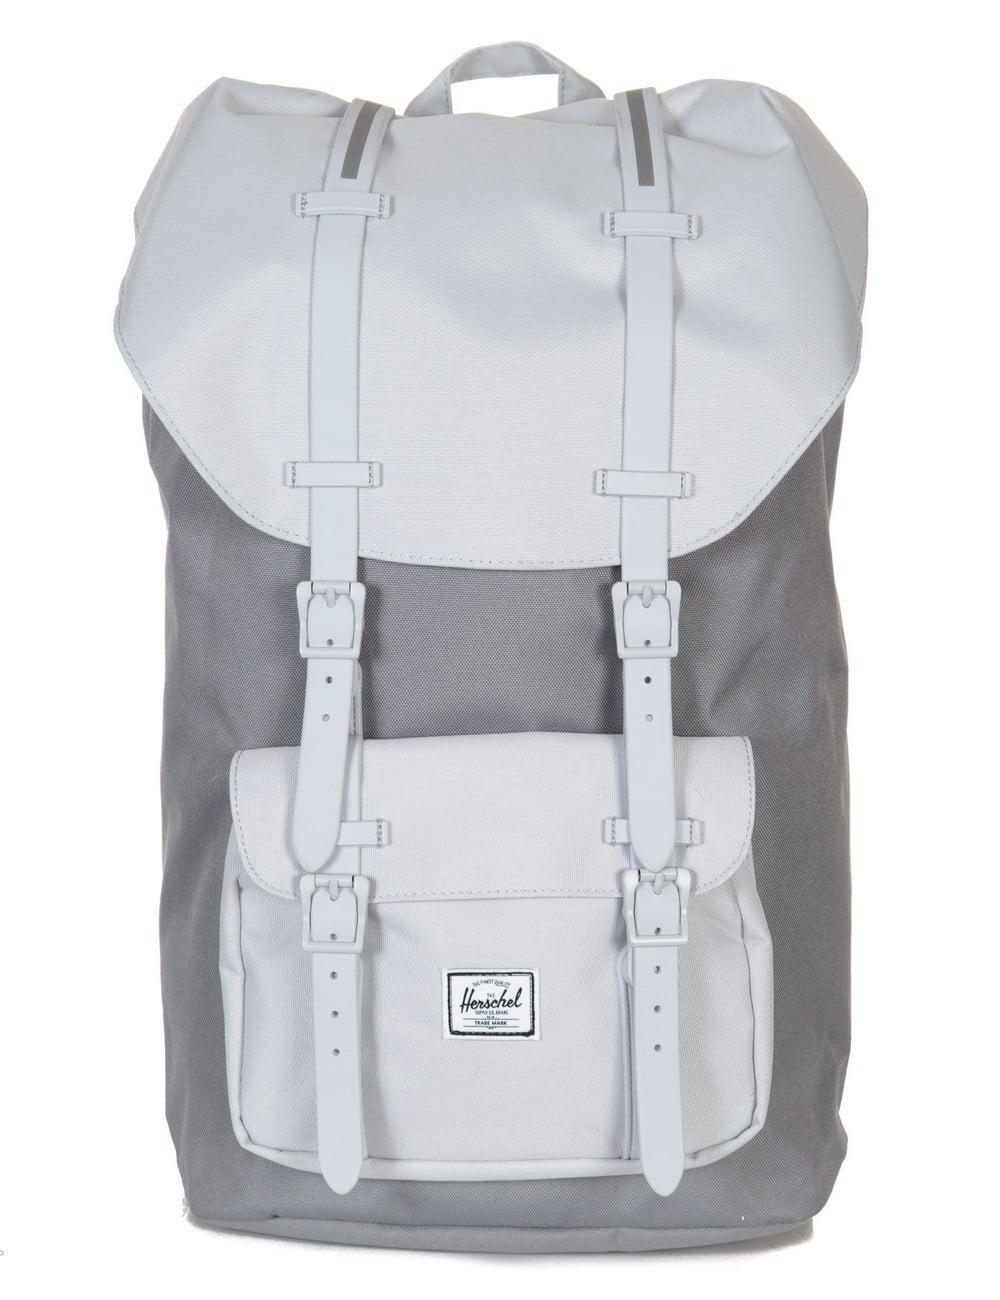 Herschel Supply Co Little America 25L Backpack - Grey Lunar Rock ... 66d7ab59007e1